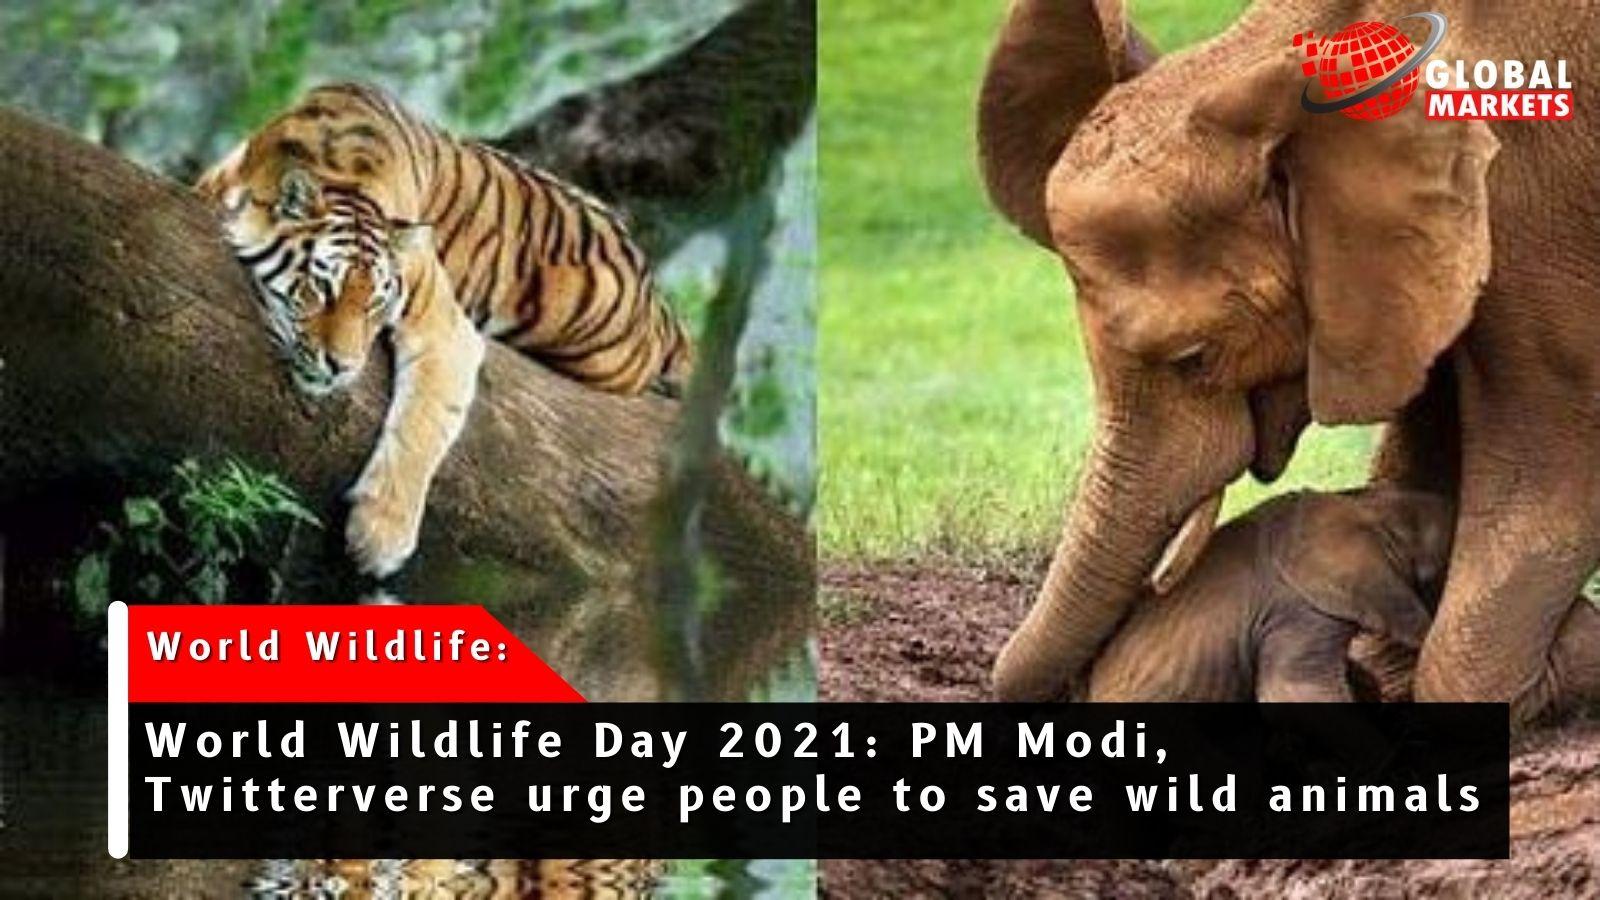 World Wildlife Day 2021: PM Modi's rise in big cat population.